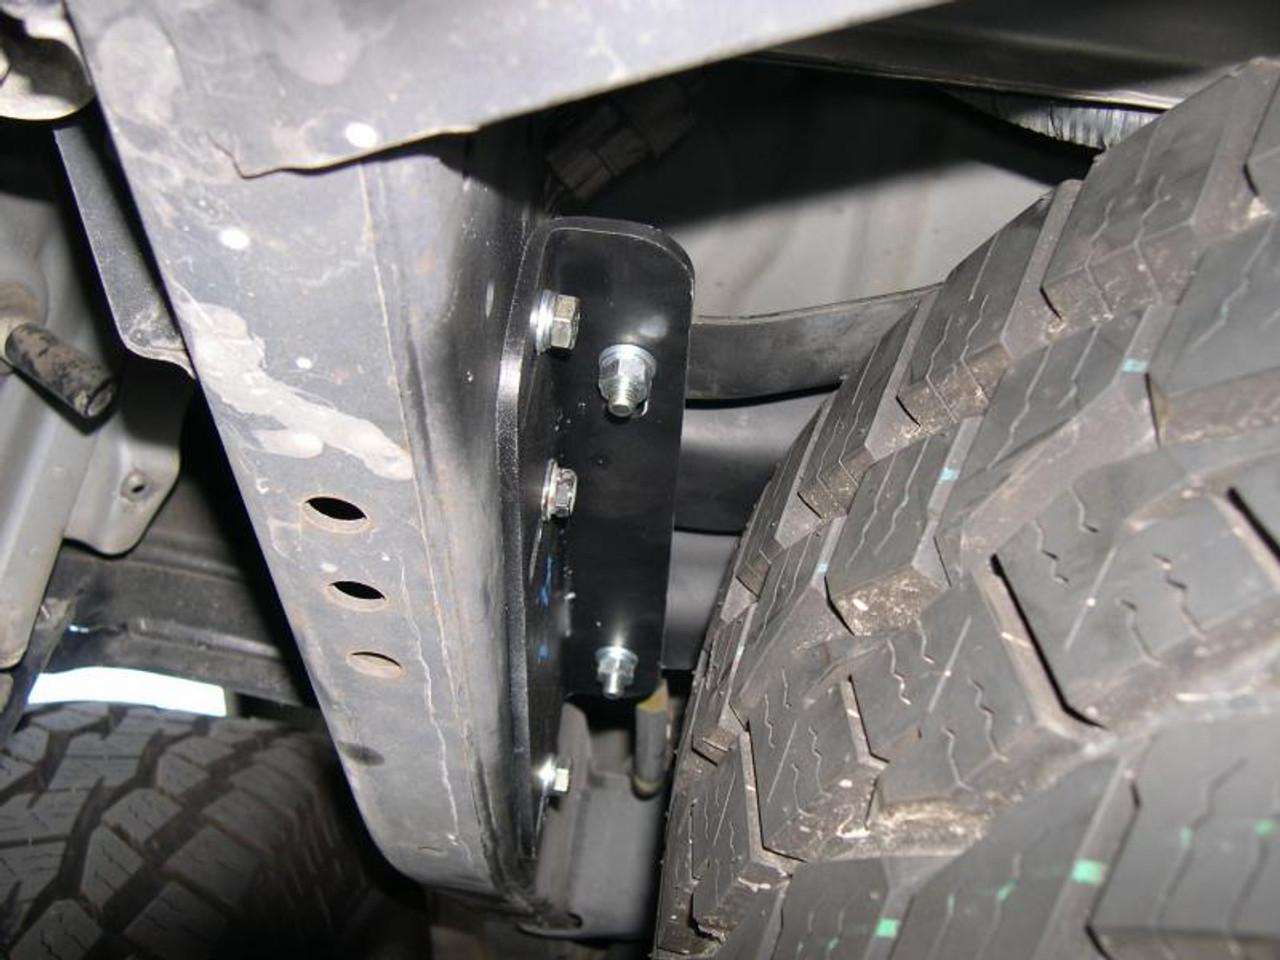 80 Series Tire Leveling Kit (TLK-1) Photo Courtesy Spartan